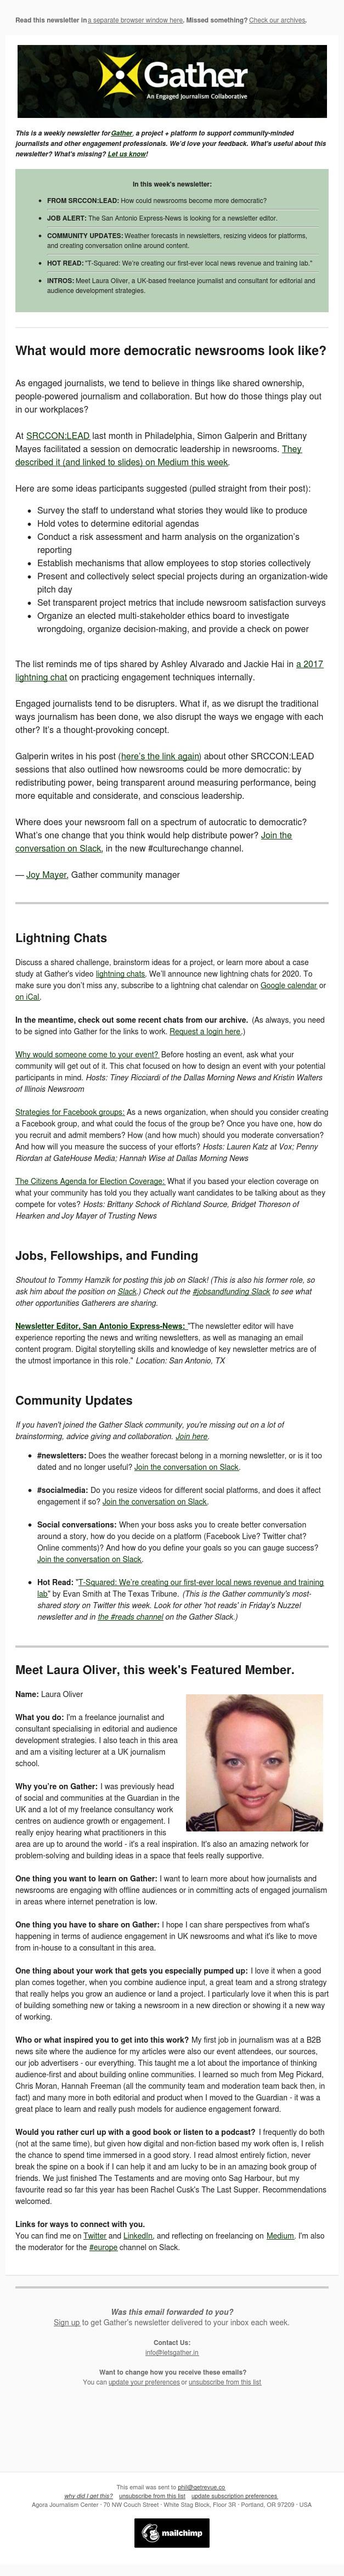 Gather: Ways to build more democratic newsrooms